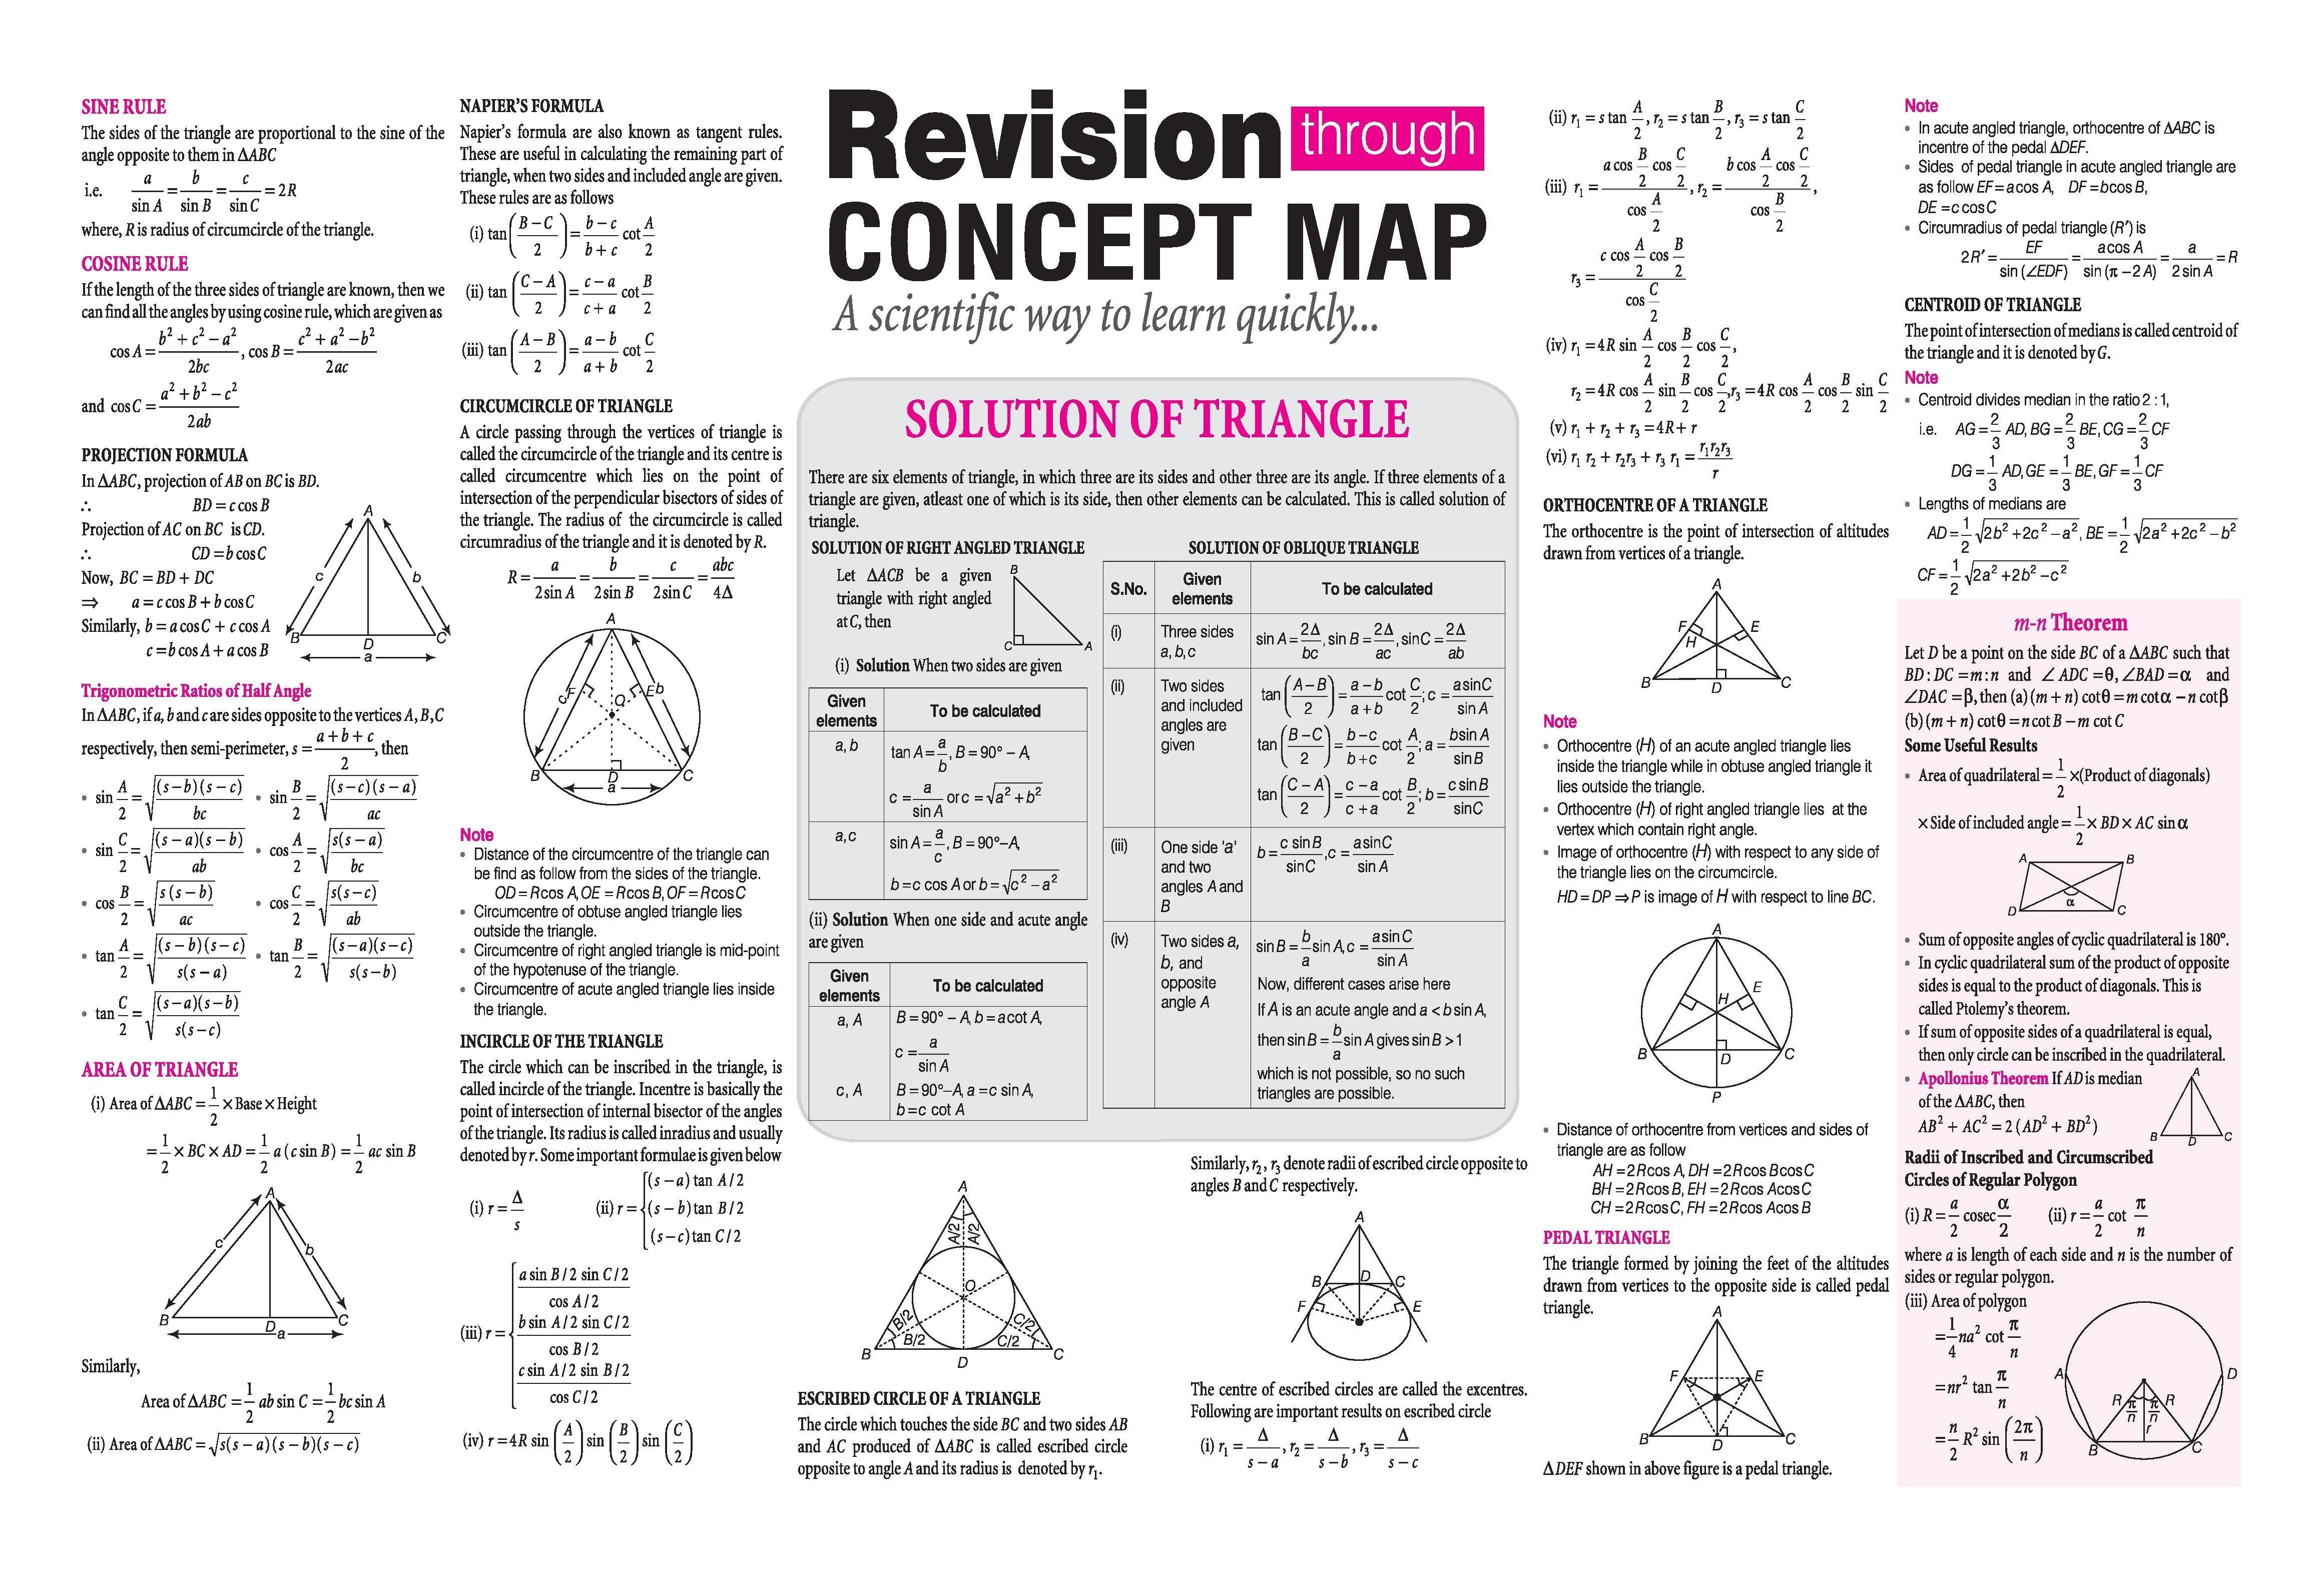 Solution Of Triangle Revision Through Concept Map Arihant Mathematics Spectrum Magazine Jeemain Studying Math Math Formulas Mathematics Education [ 3150 x 4644 Pixel ]